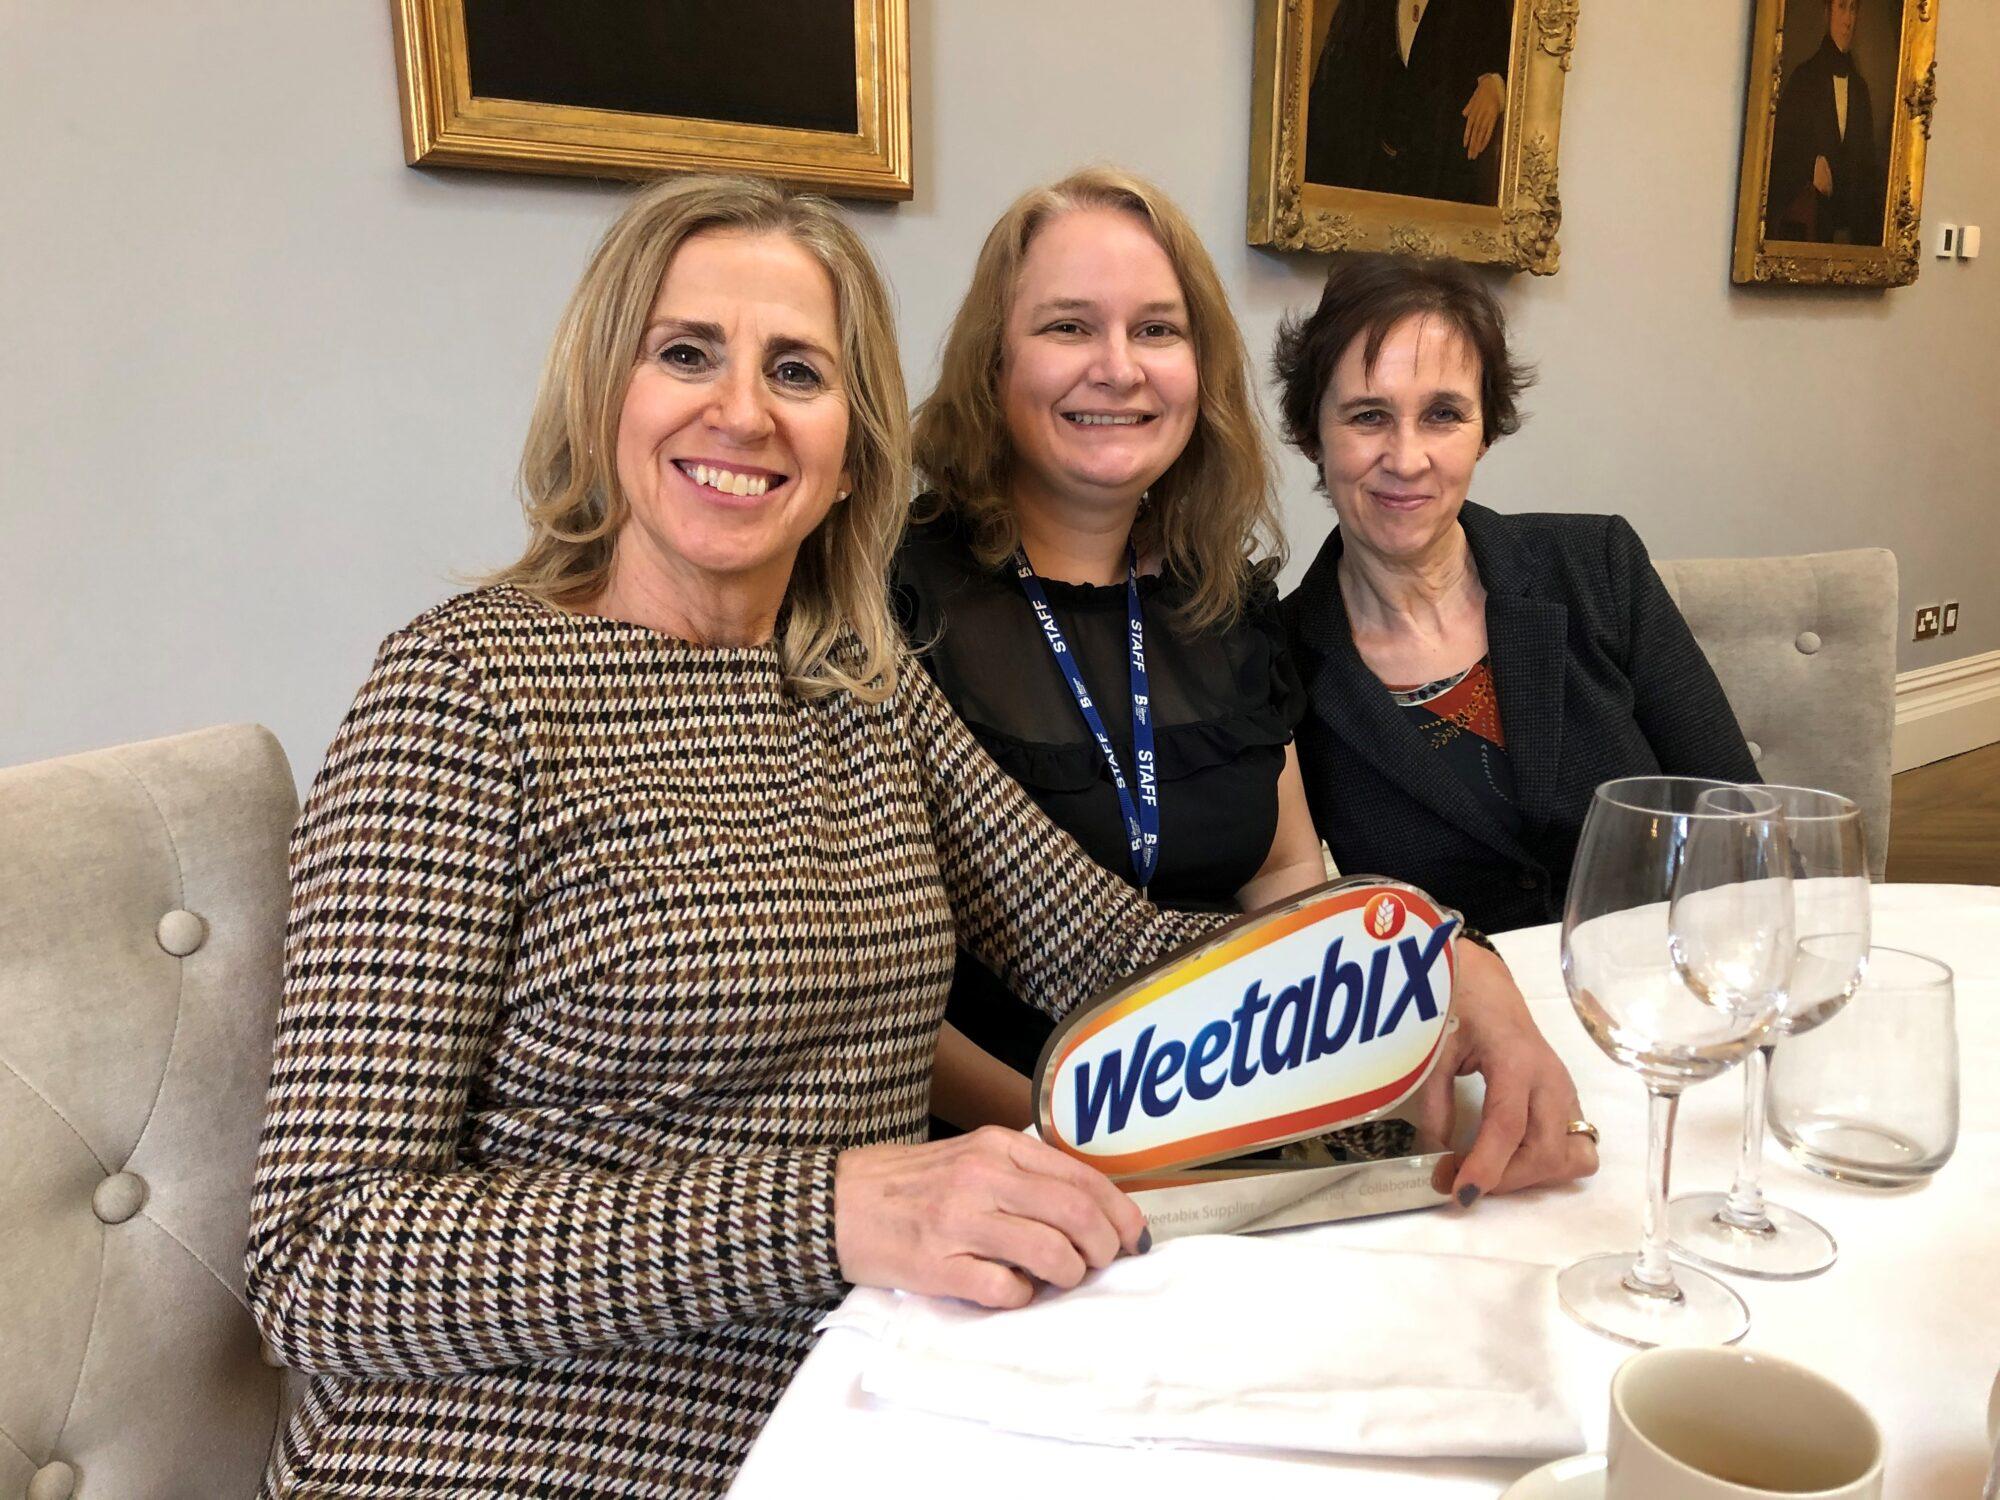 Star supplier to Weetabix PR story